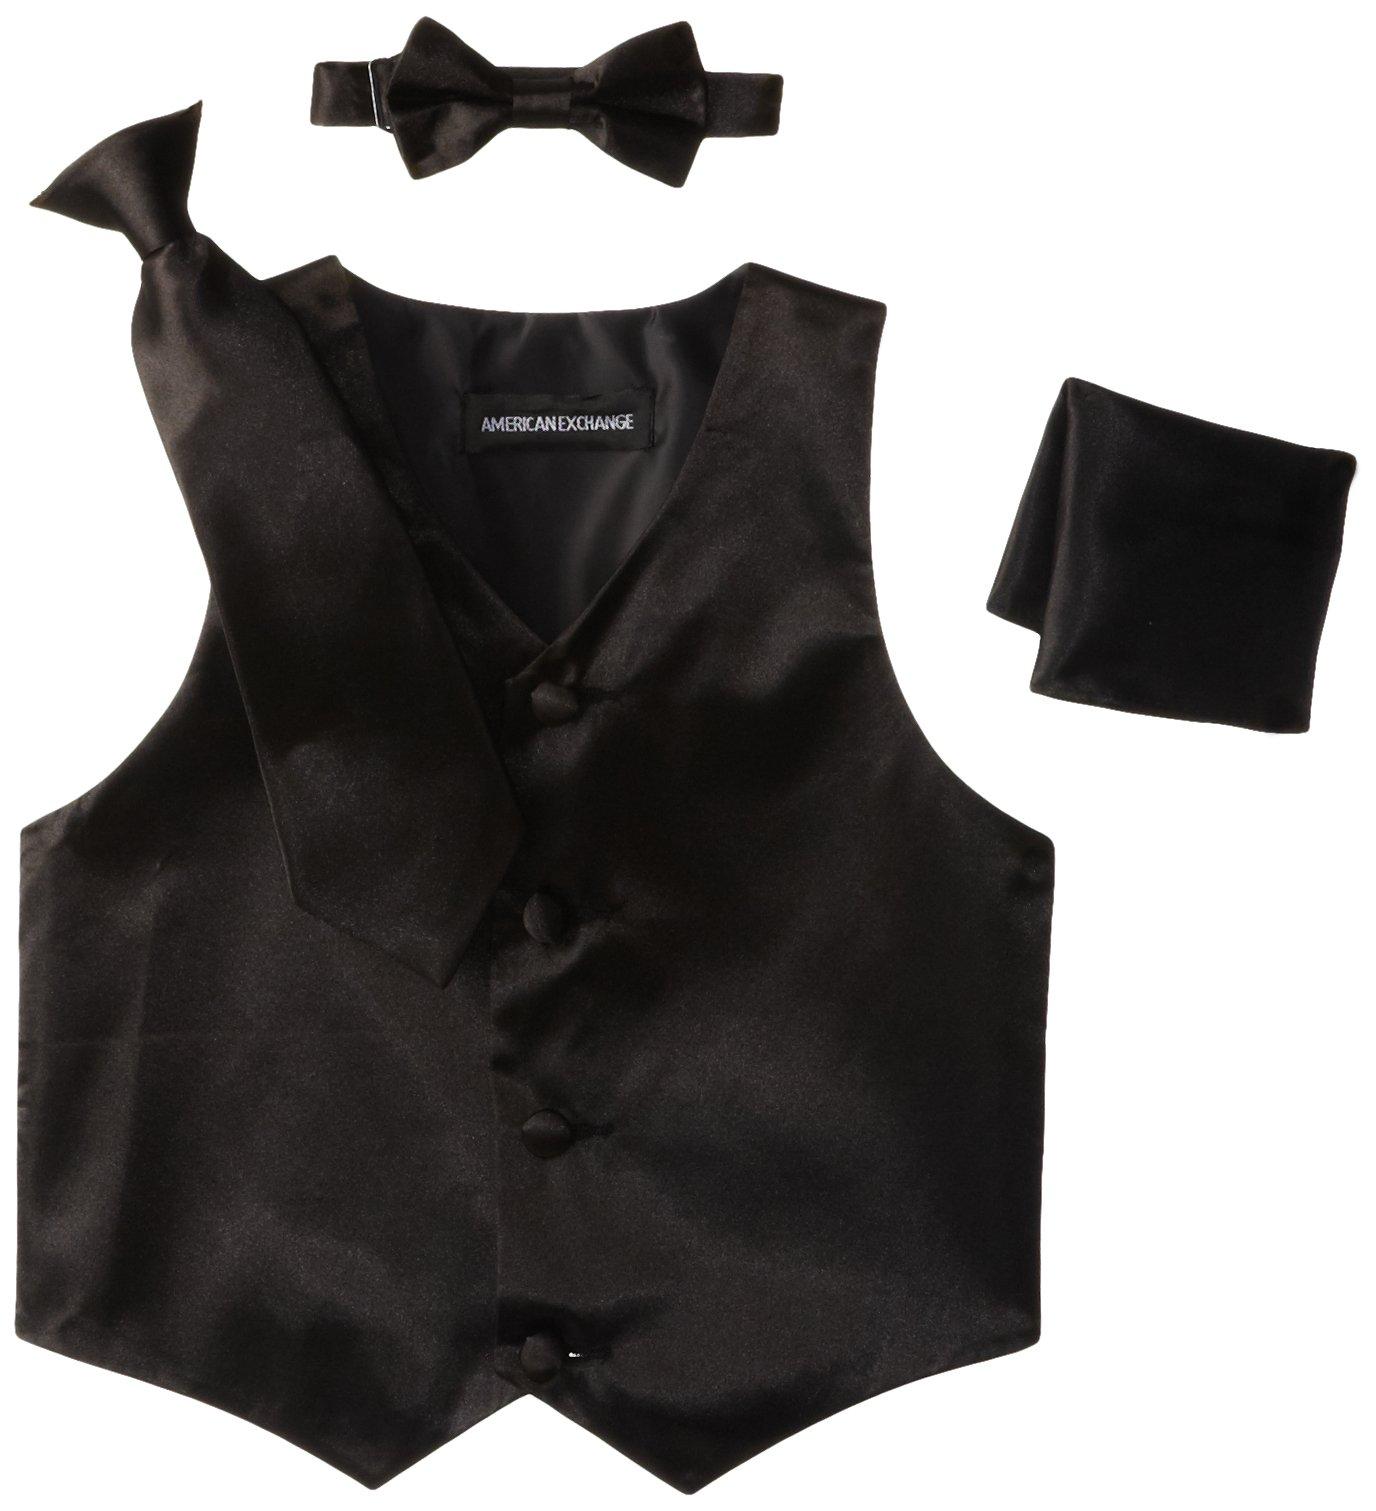 American Exchange Little Boys' Toddler Satin 4 Piece Vest Set, Black, 2T